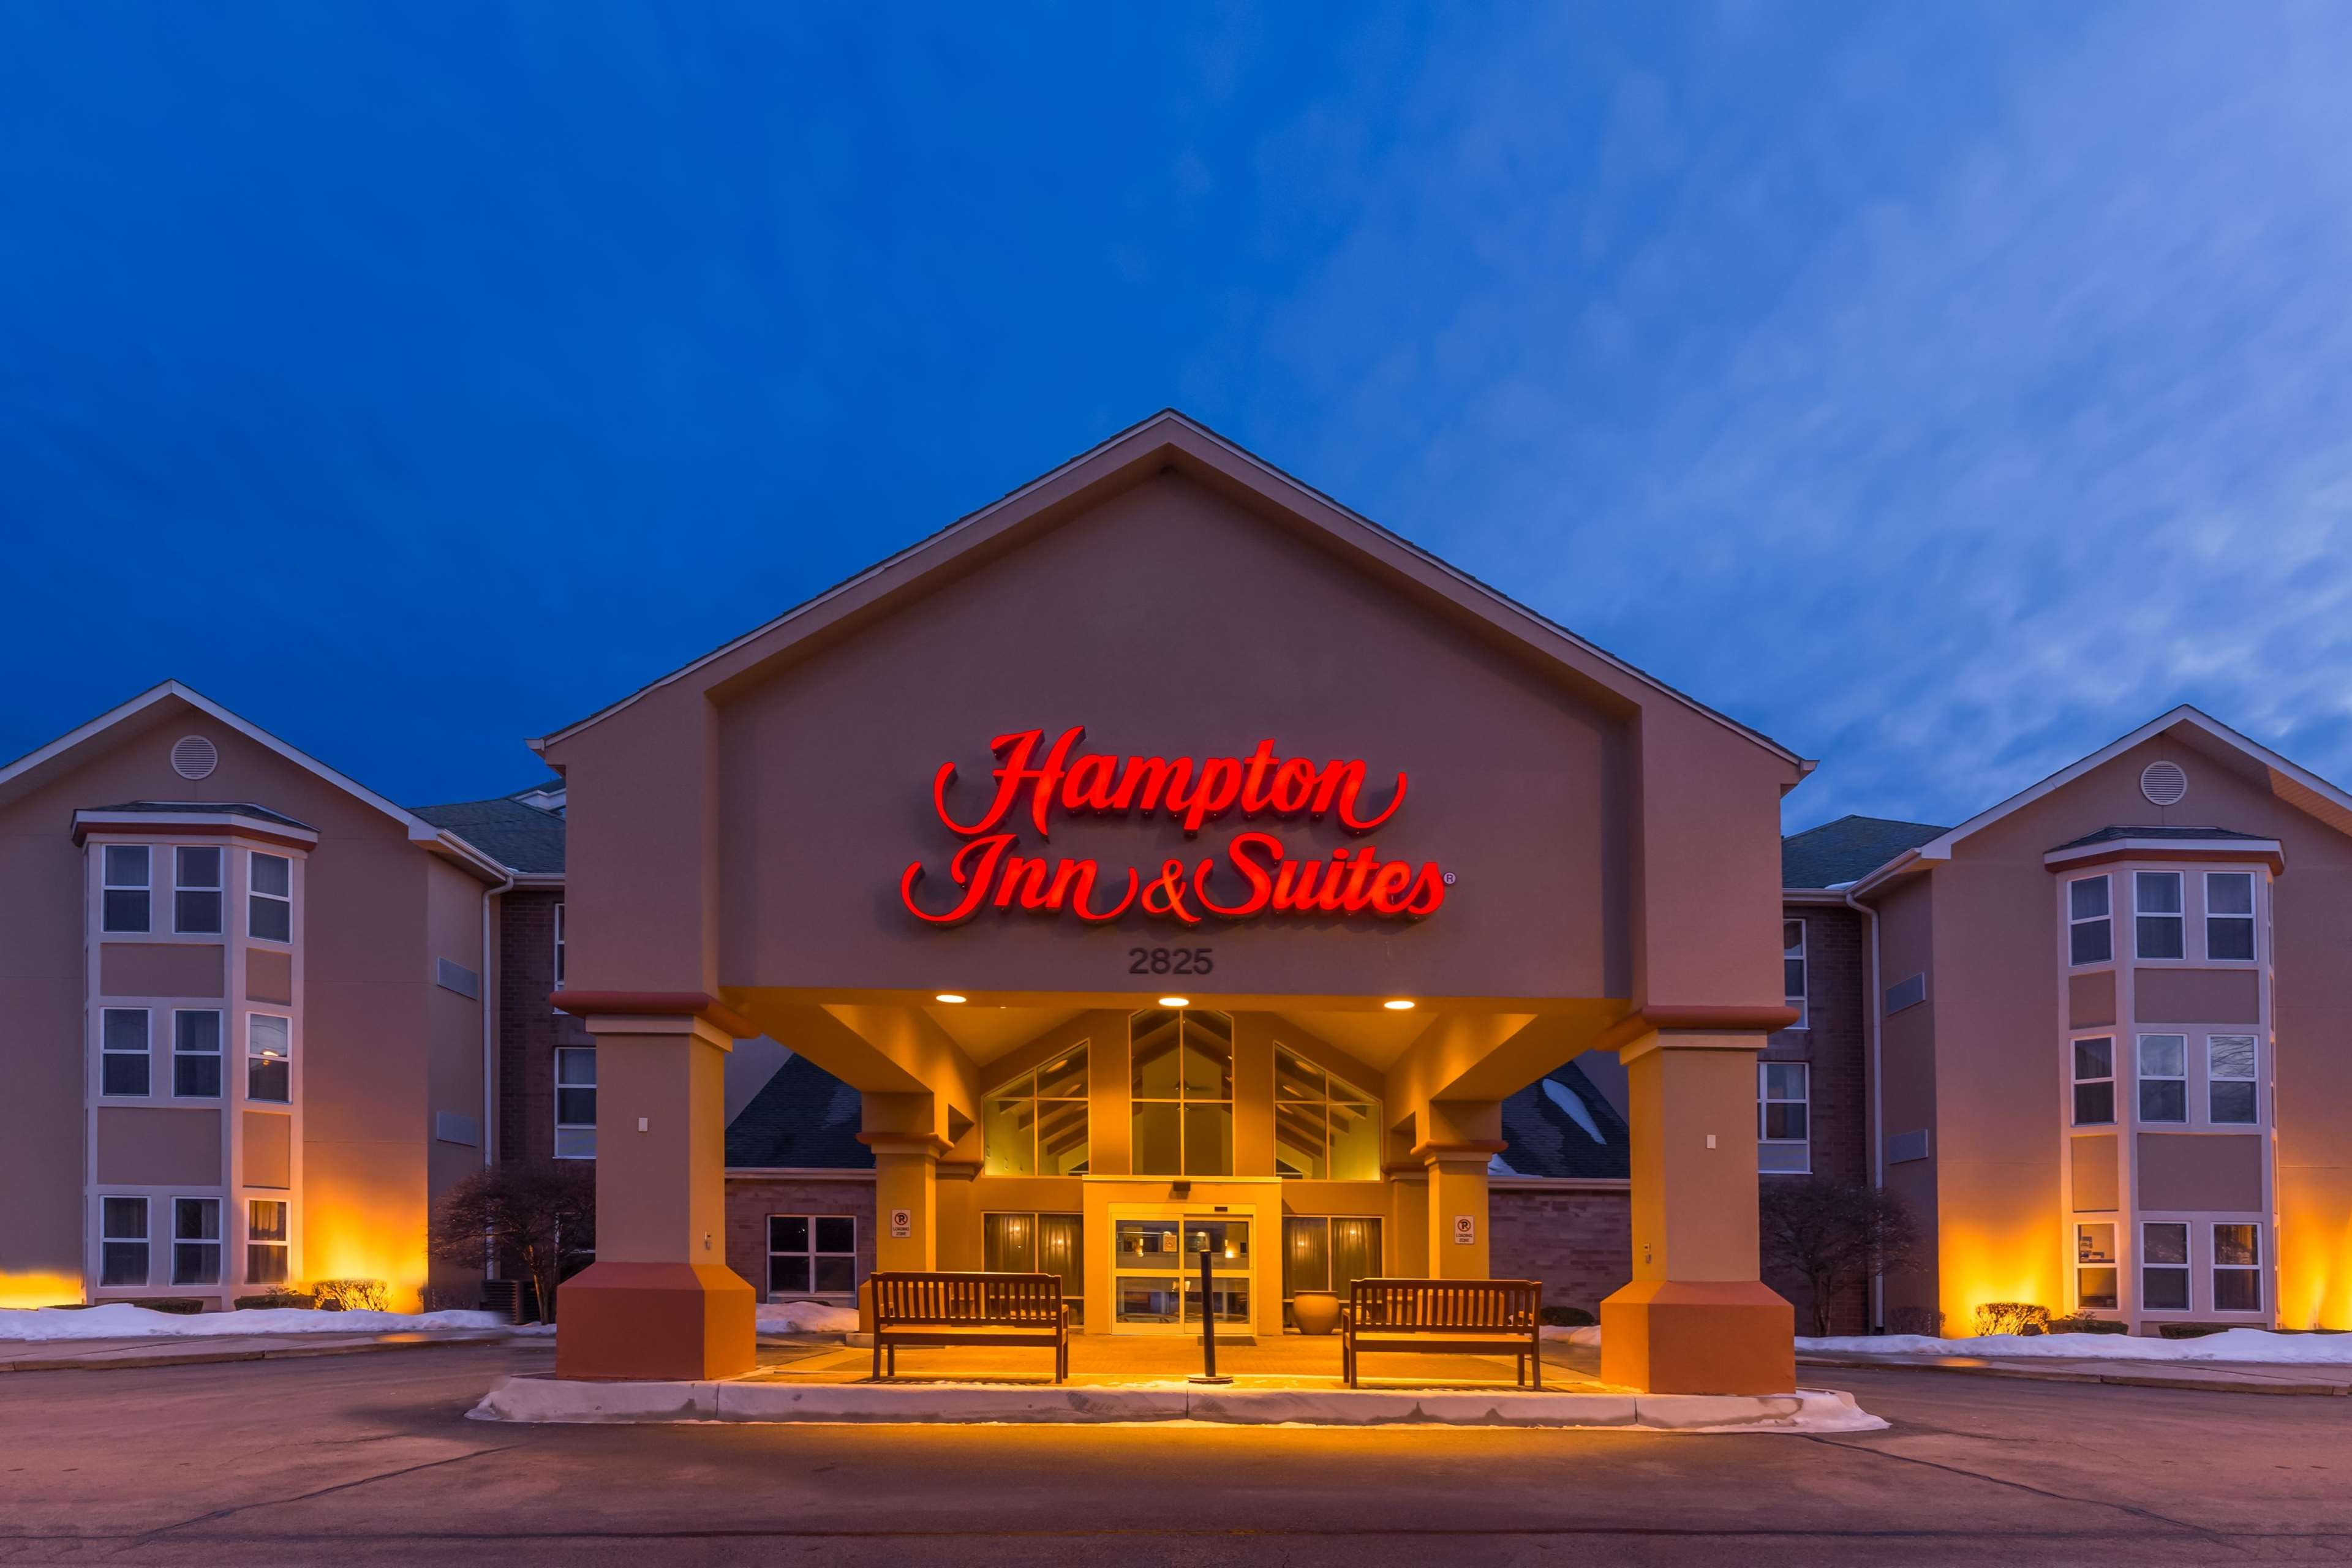 Hampton Inn & Suites Chicago/Hoffman Estates image 20